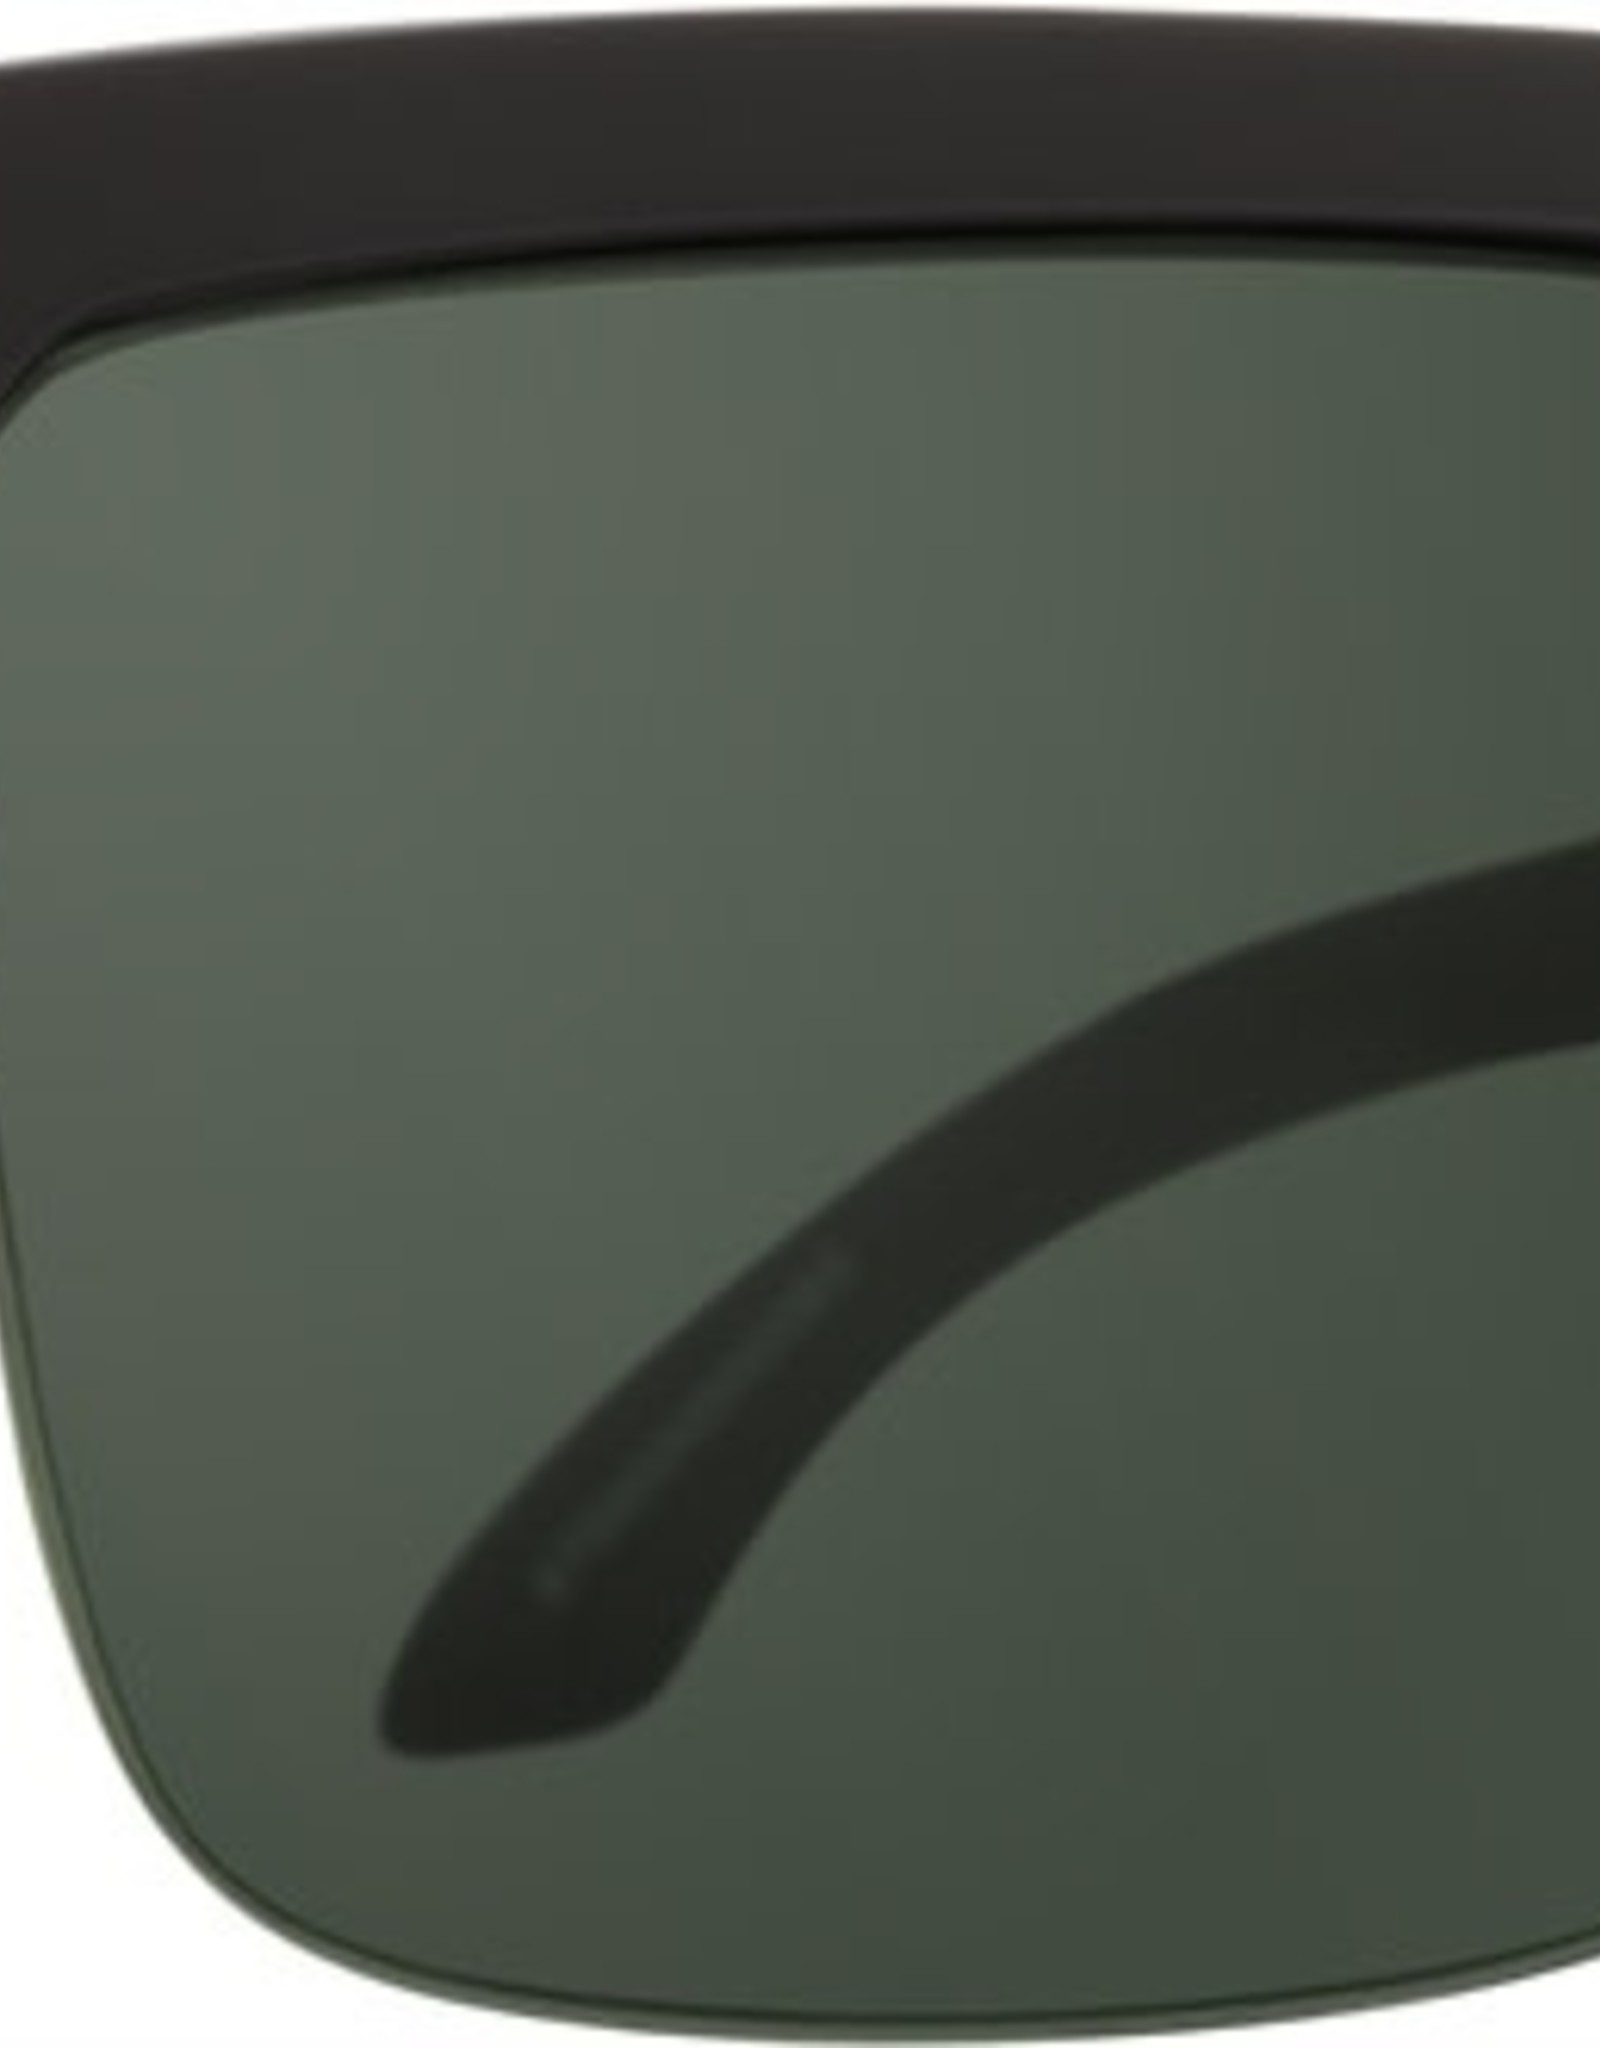 SPY Helm 5050 Black hd+ grey green